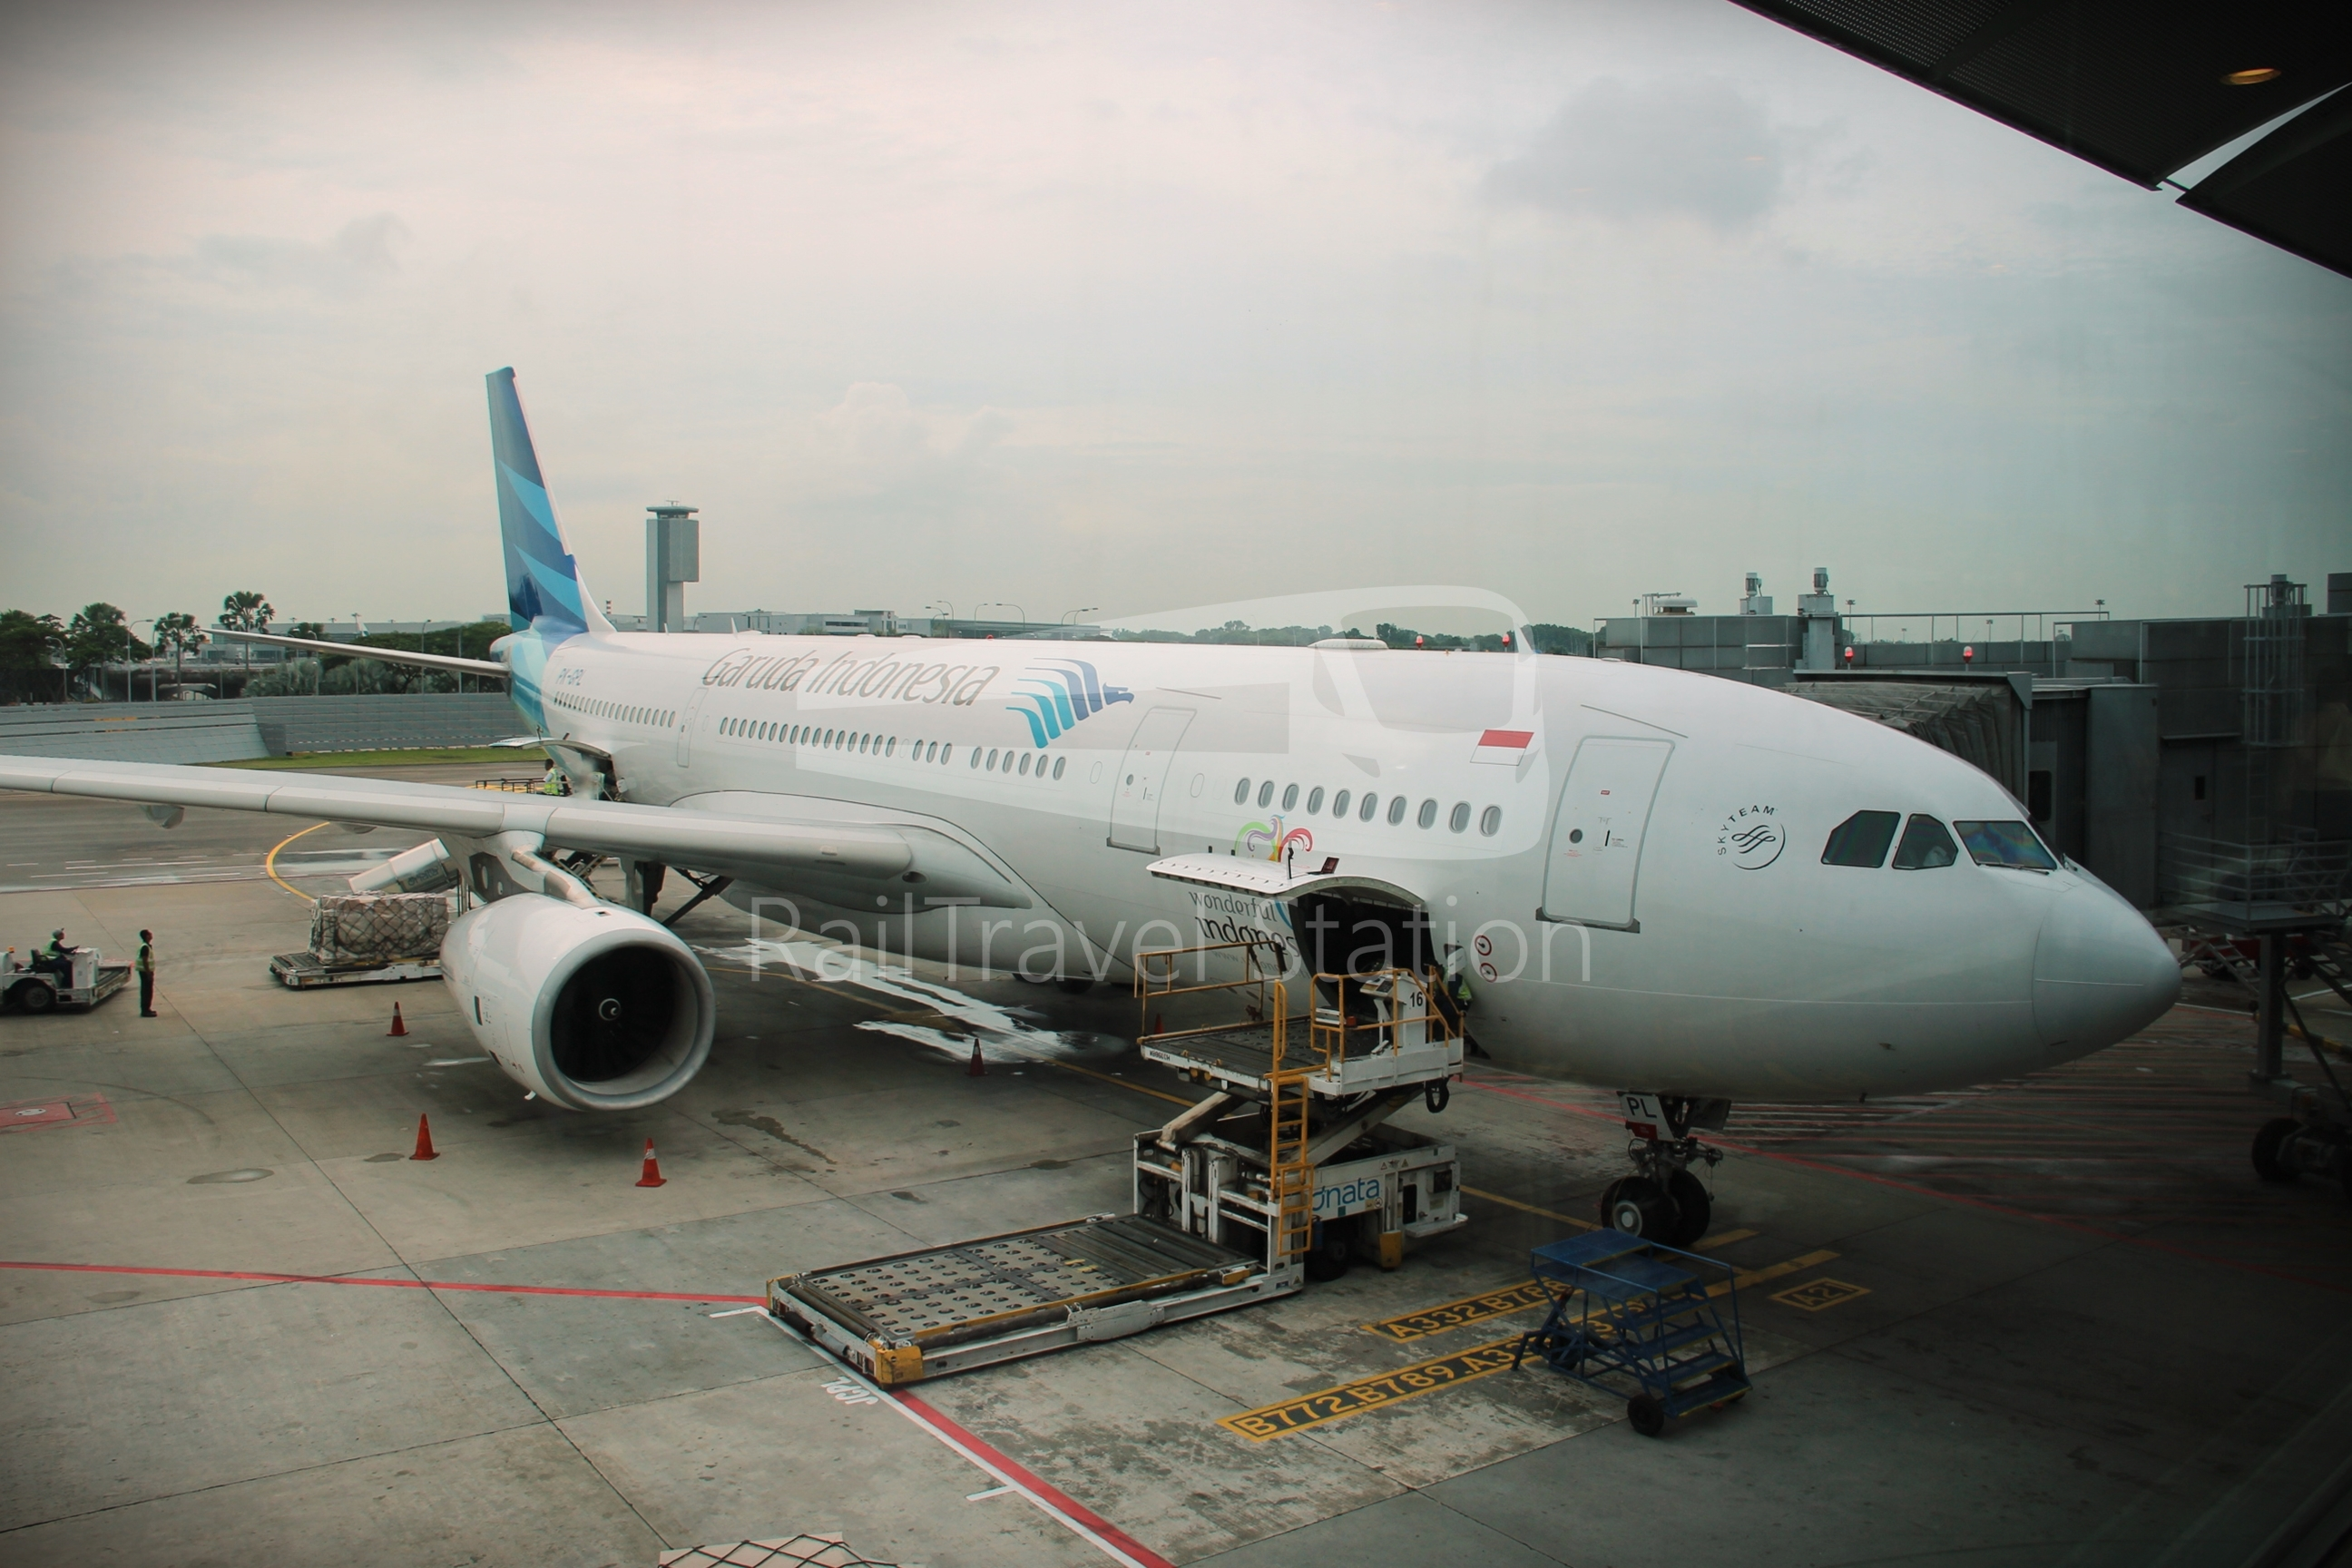 Garuda Indonesia GA825: Singapore to Jakarta Soekarno-Hatta by Airbus A330-200